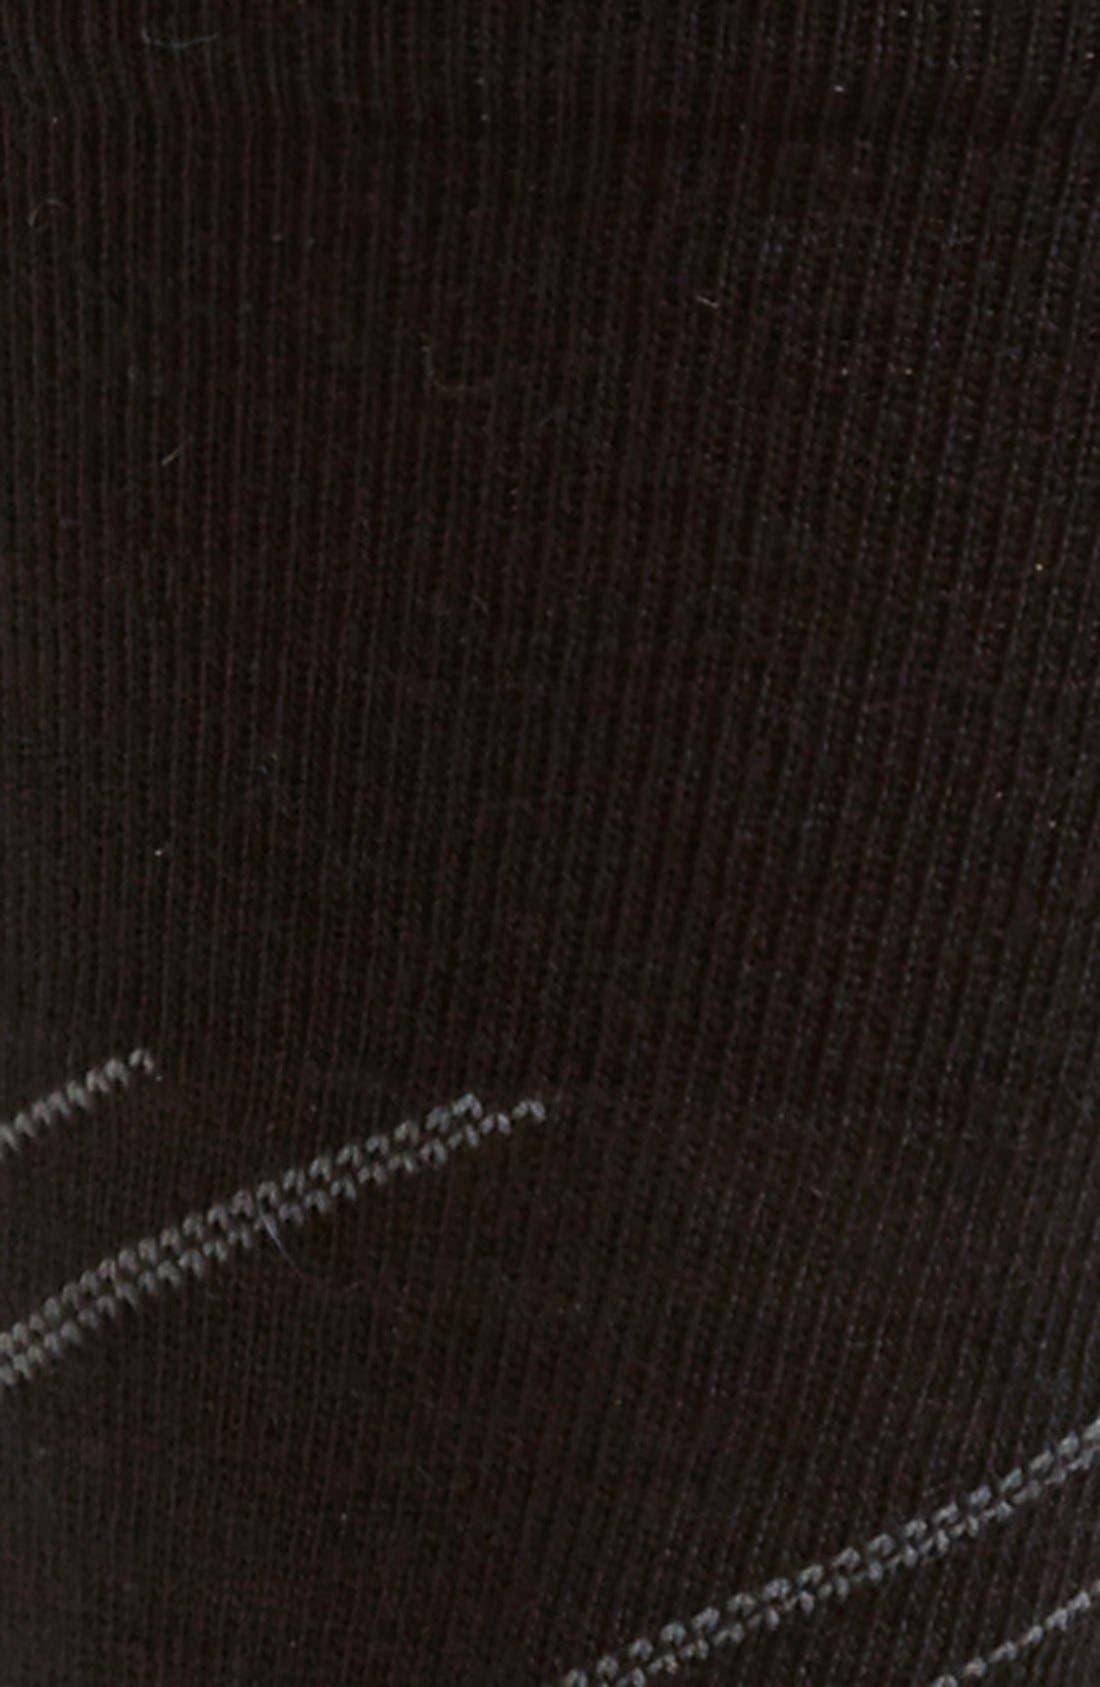 'Barber Pole' Socks,                             Alternate thumbnail 2, color,                             001